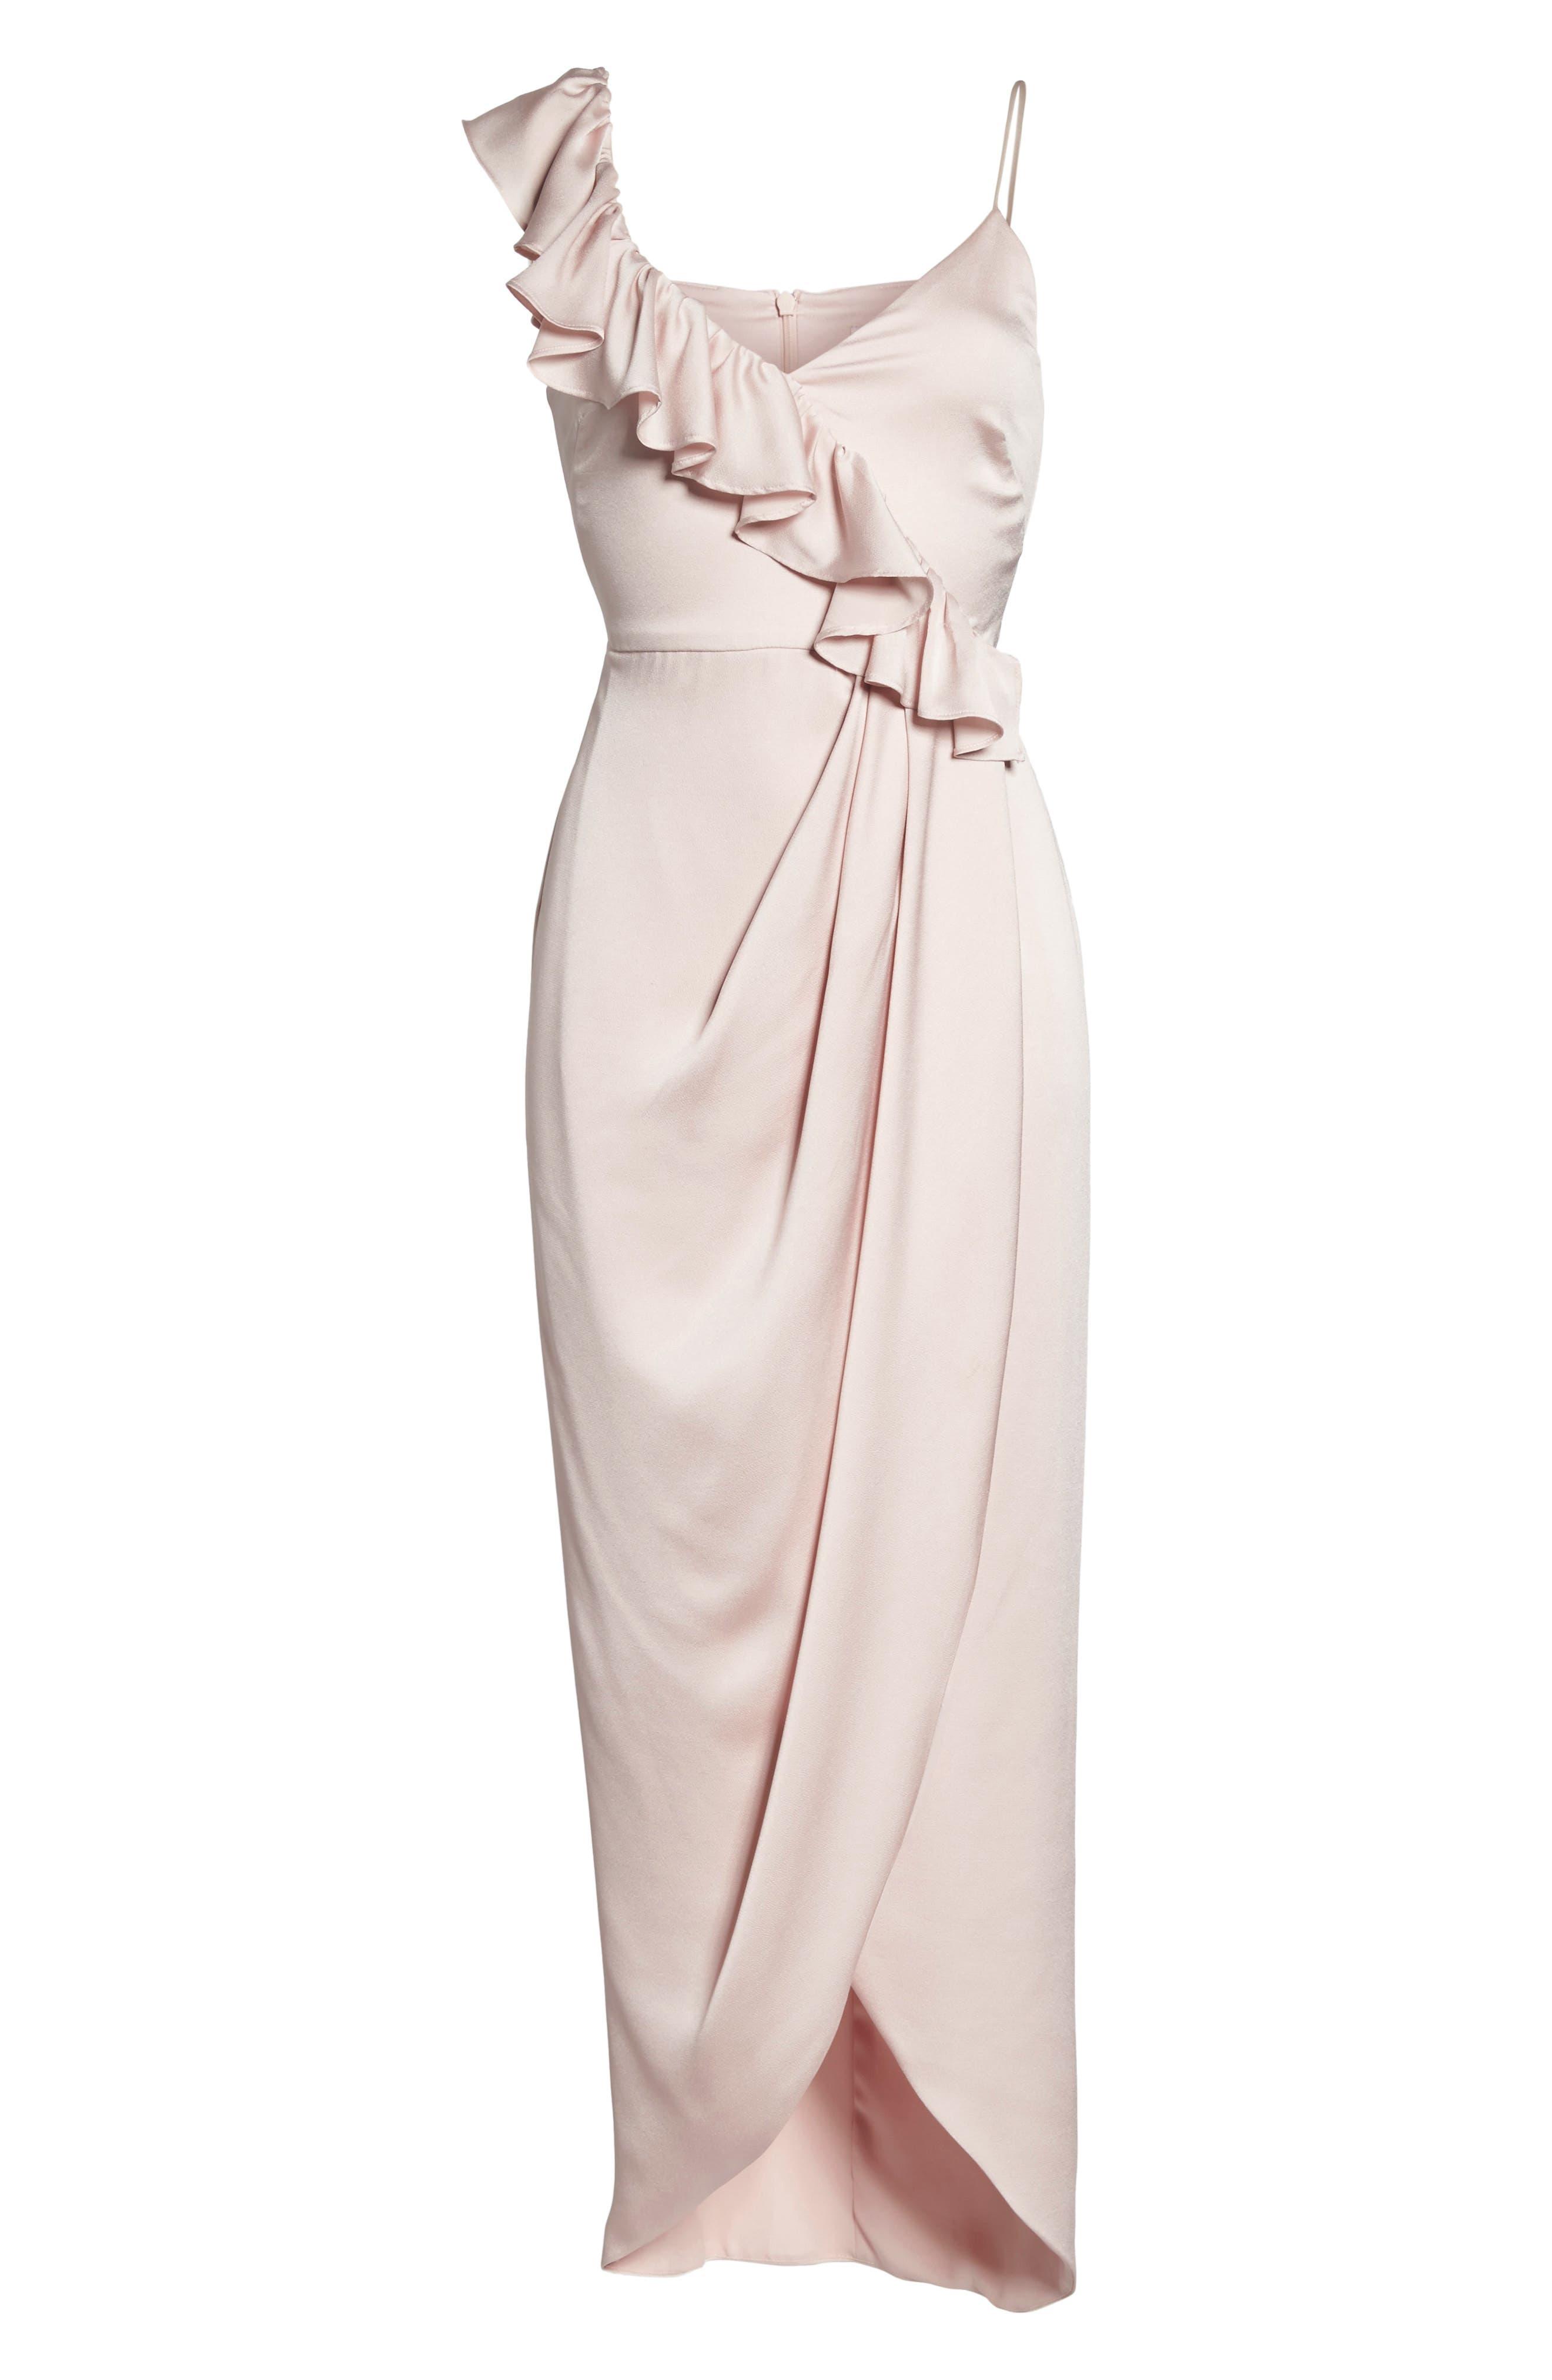 Luxe Asymmetrical Frill Maxi Dress,                             Alternate thumbnail 12, color,                             Porcelain